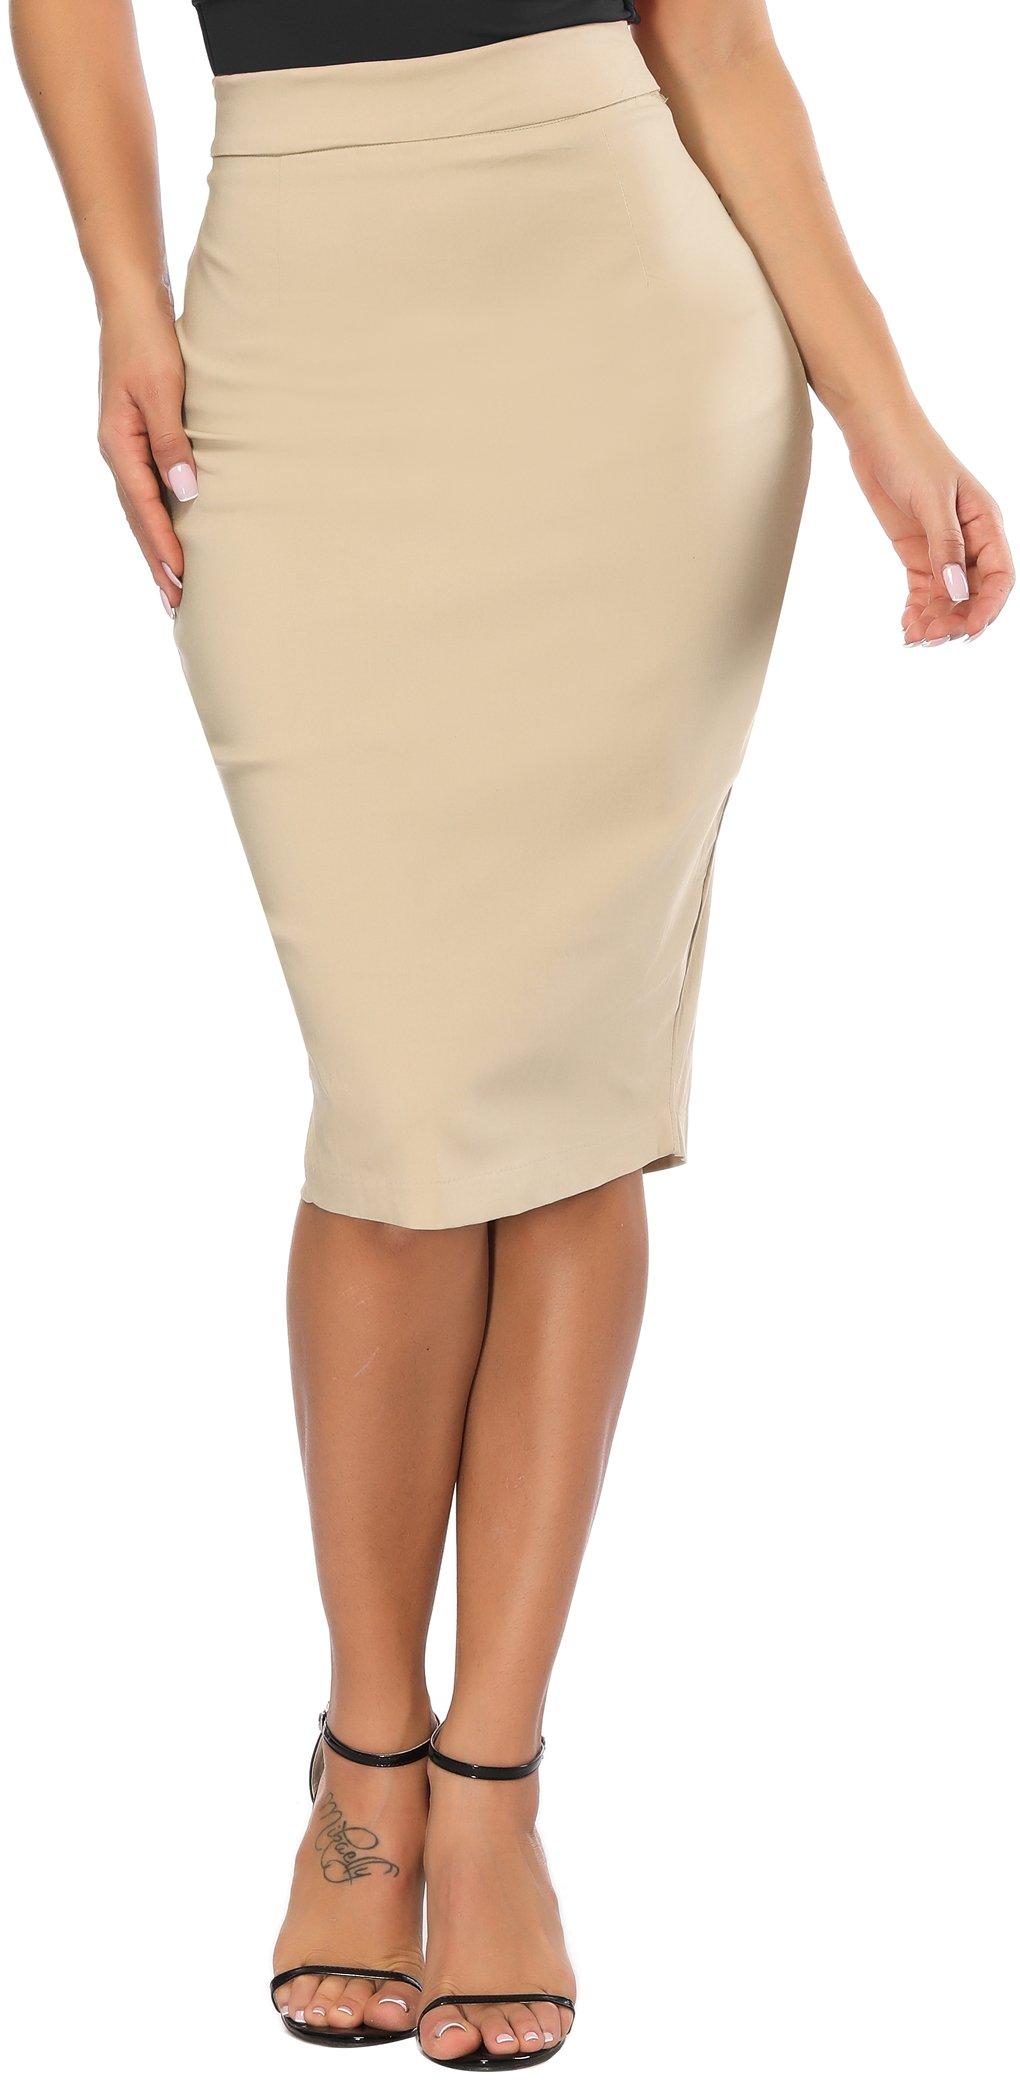 Calvin & Sally Below Knee Pencil Skirt, Womens High Waist Elastic Stretchy Bodycon Pencil Skirt (Khaki XL)